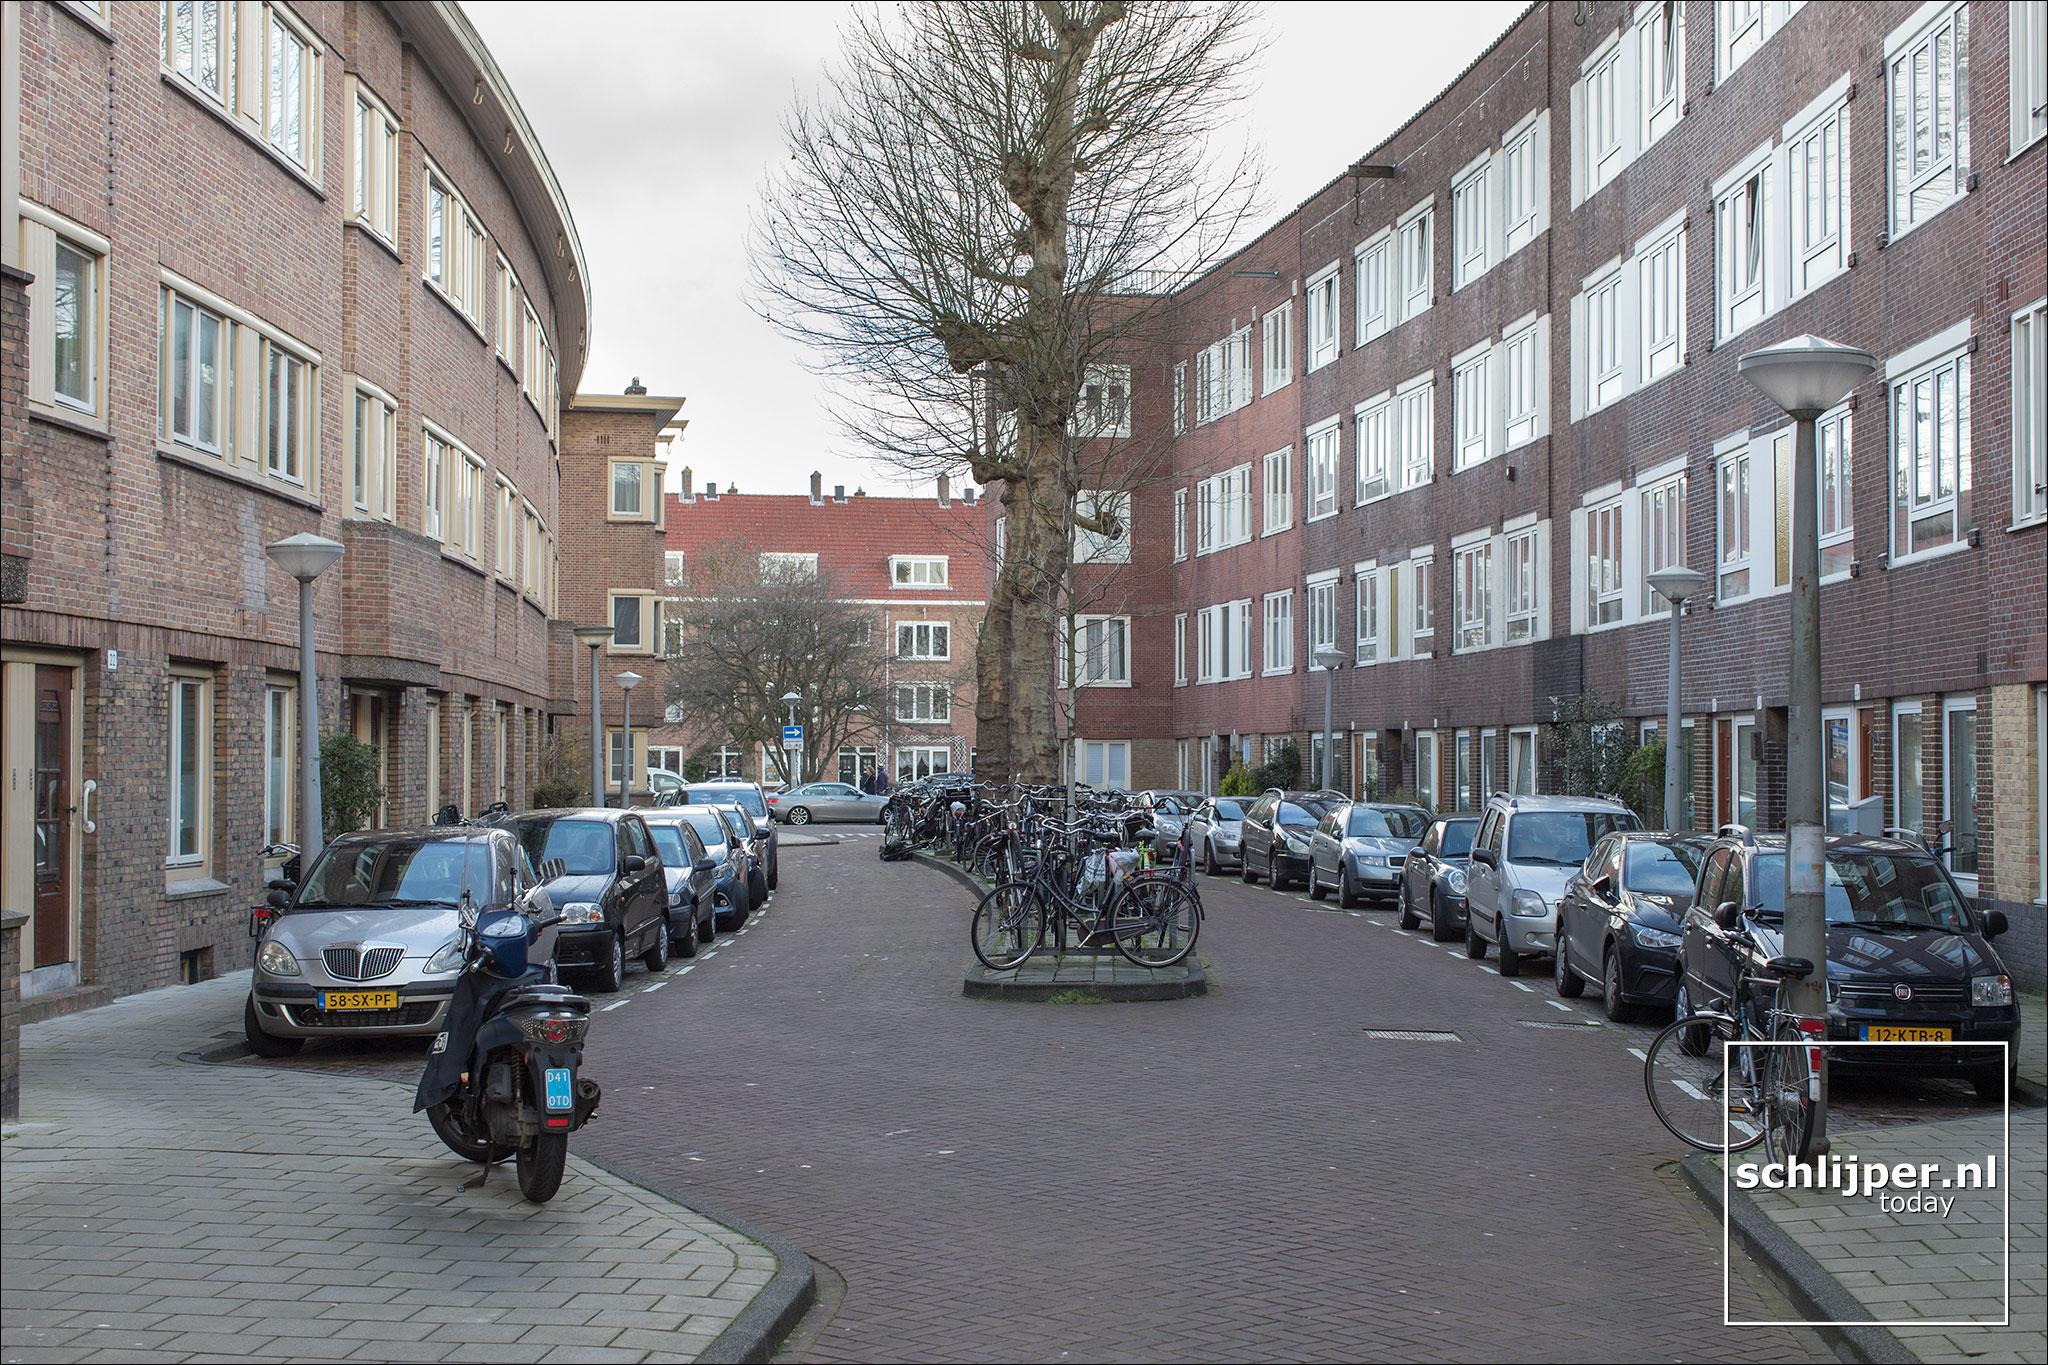 Nederland, Amsterdam, 5 maart 2019